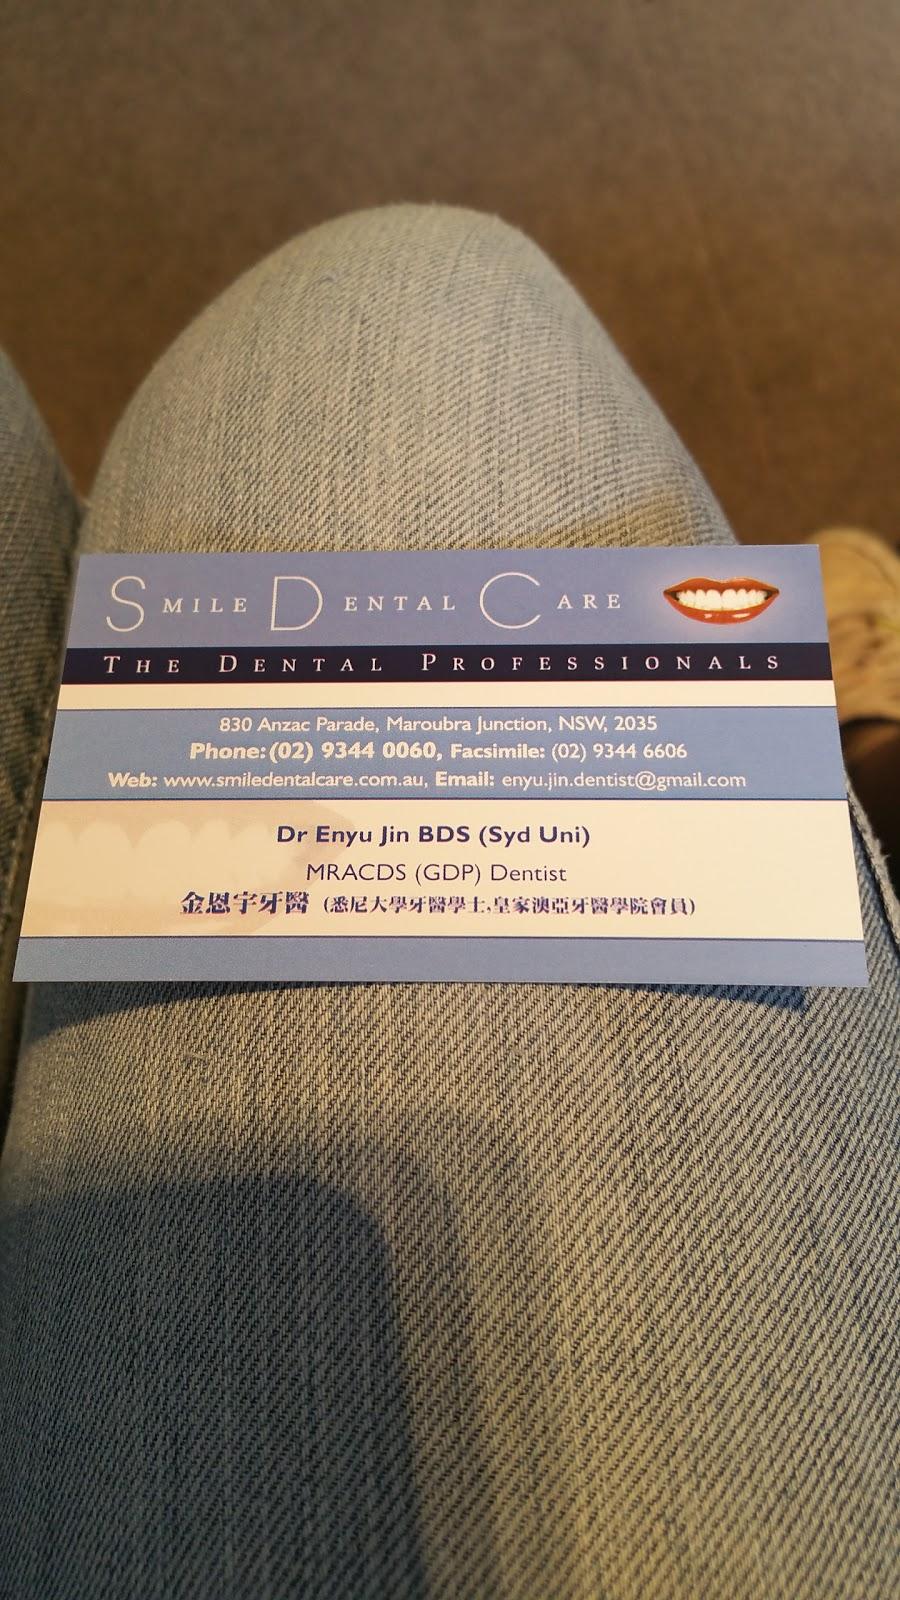 Smile Dental Care - Dr. Jin Enyu   dentist   830 Anzac Parade, Maroubra NSW 2035, Australia   0293440060 OR +61 2 9344 0060